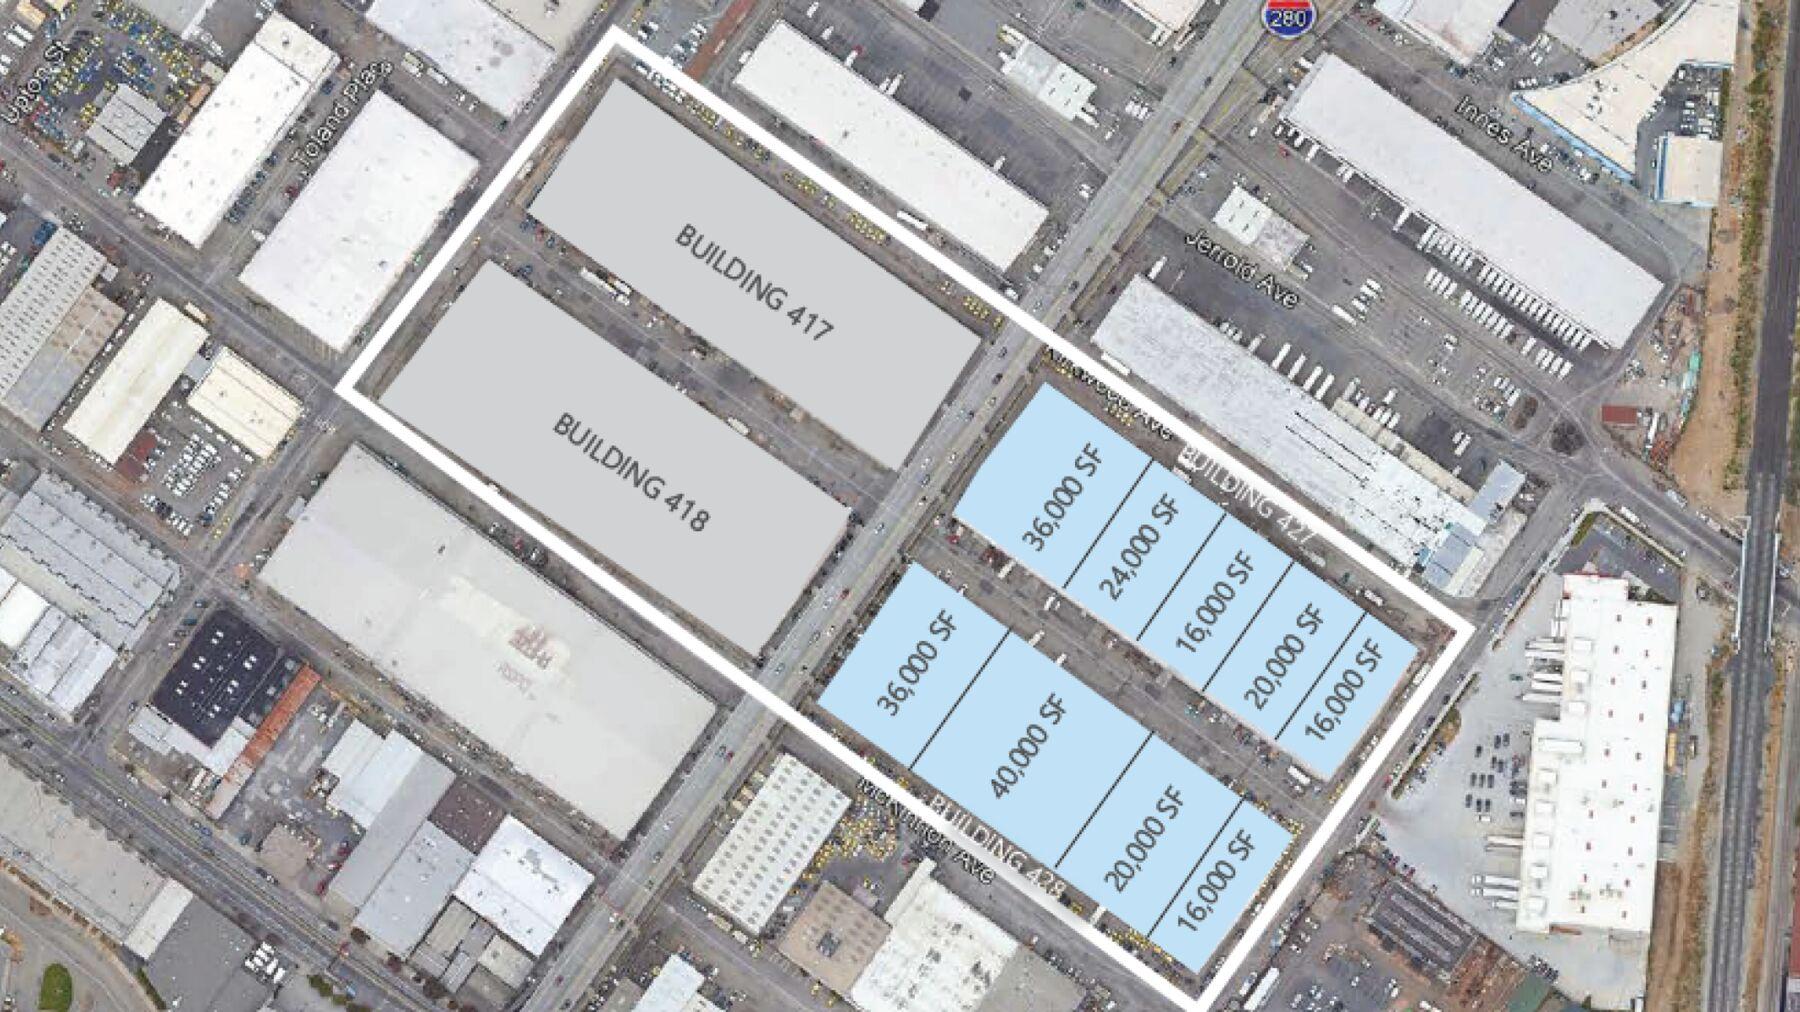 DPM-San-Francisco-IP-1-4_1.jpg